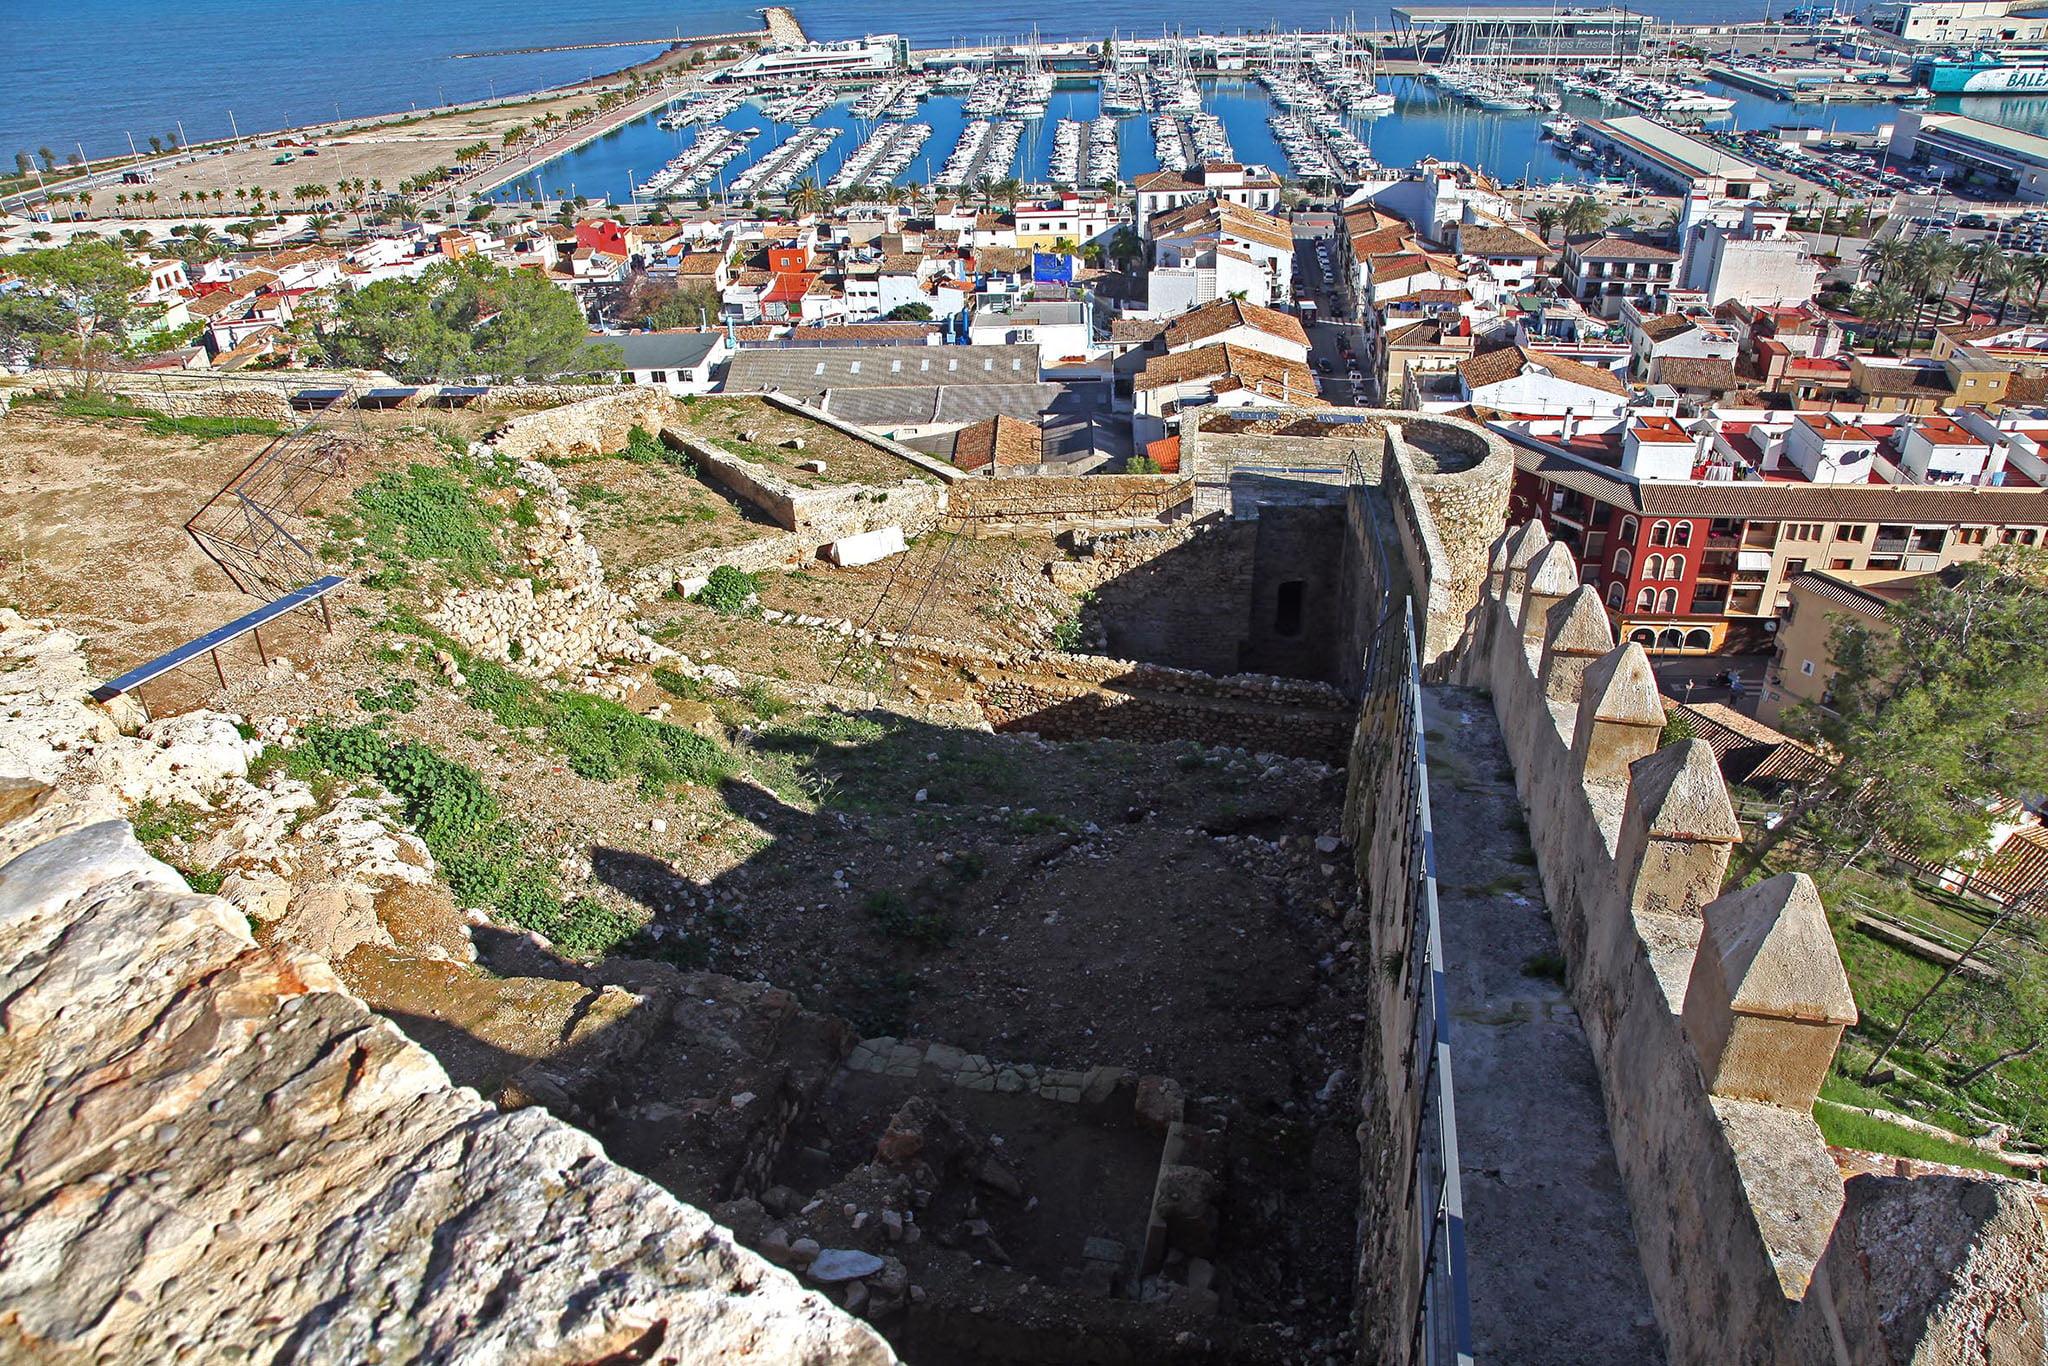 El Verger Alt, zona del castillo de Dénia situada frente al puerto